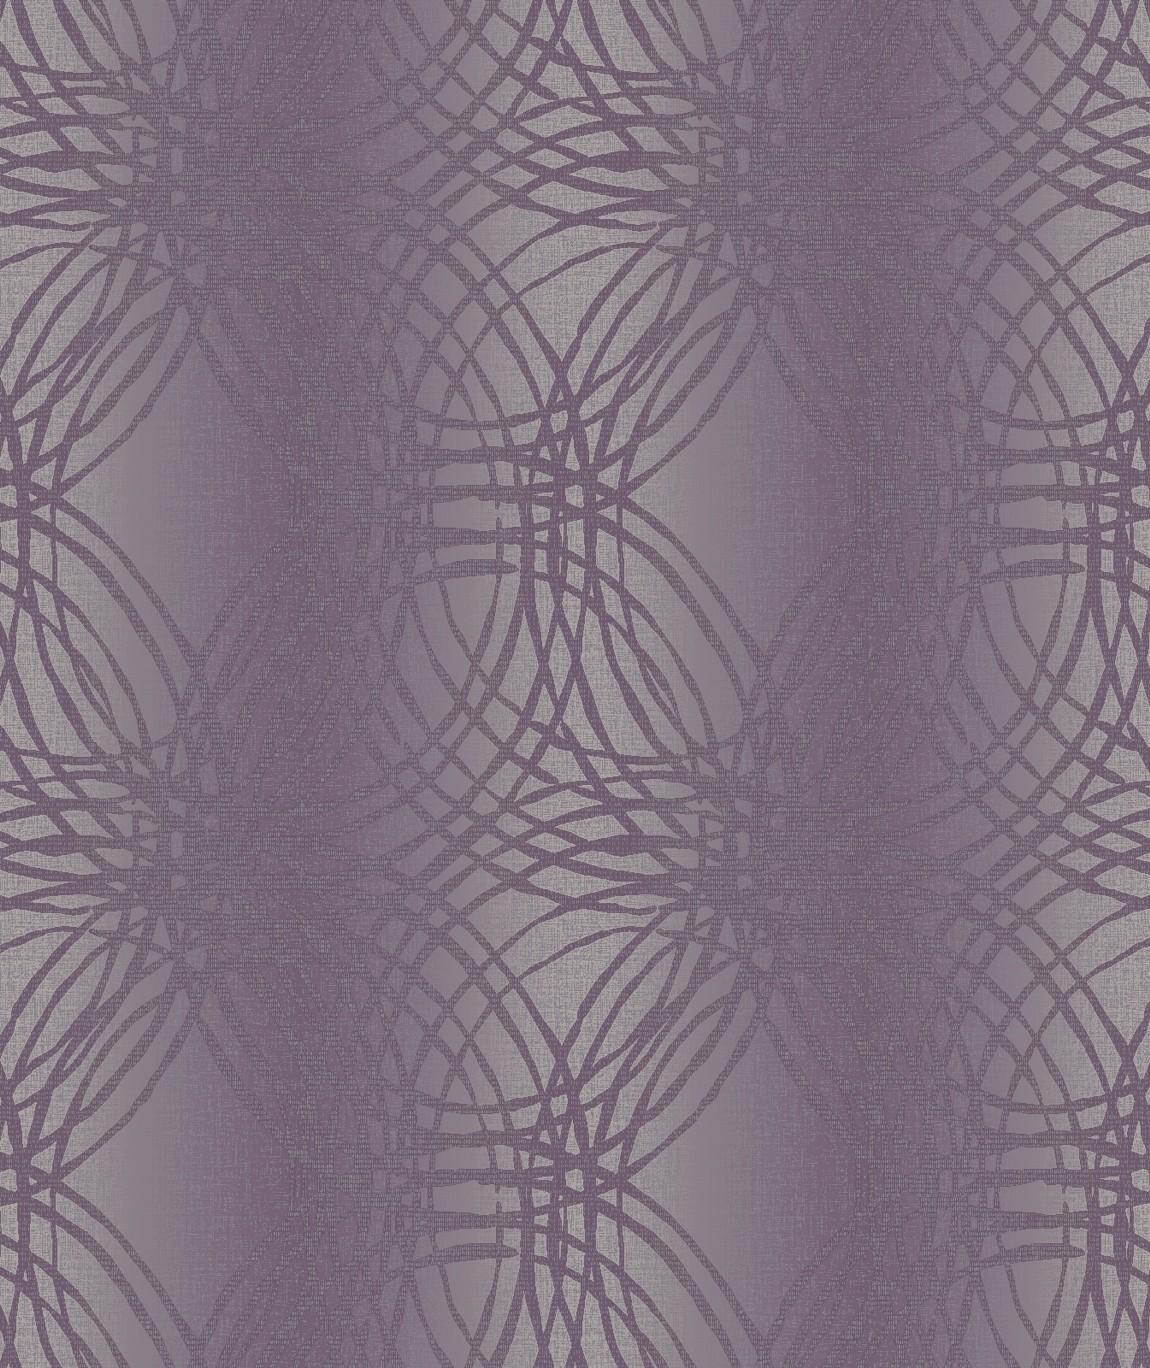 Tapety na zeď Vavex BOA-015-02-5 | 0,53 x 10,05 m (Vinylová tapeta - fialové kruhy)